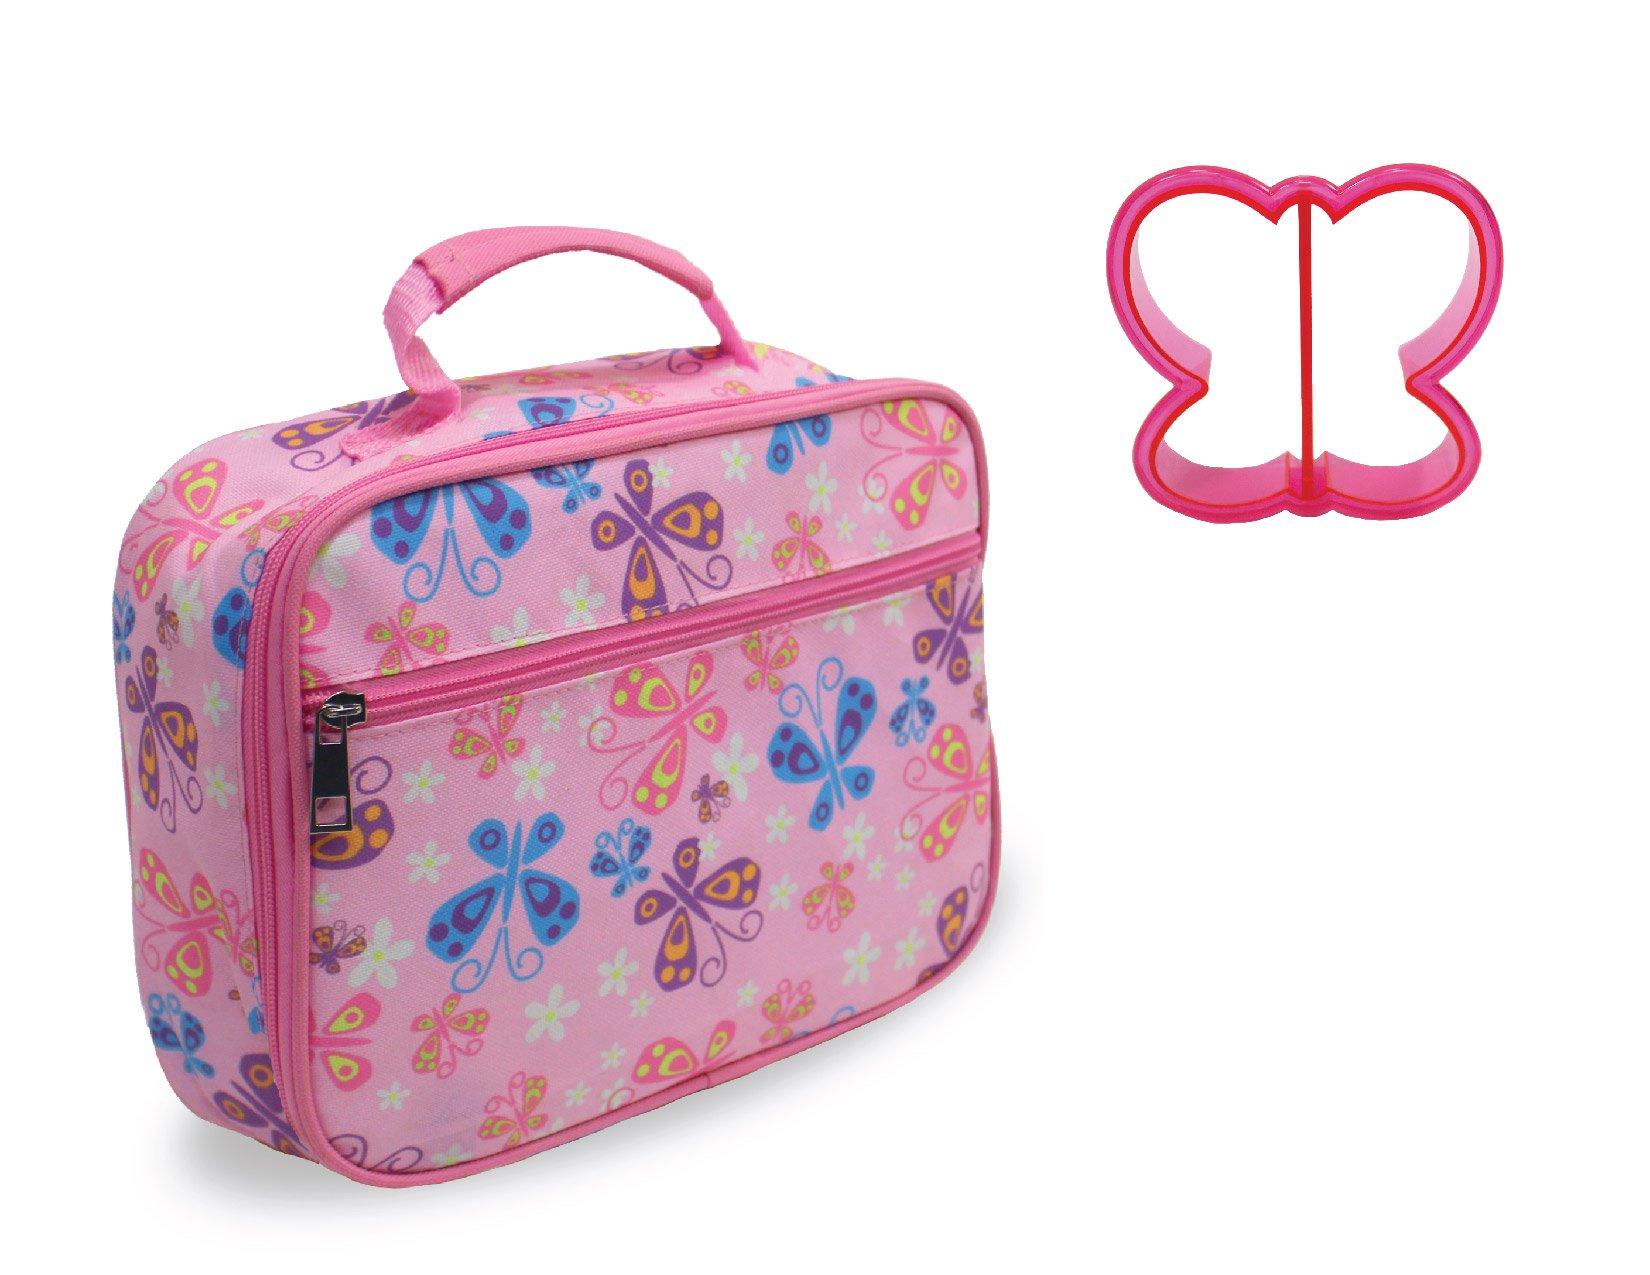 Lunch Box Butterfly Print with Butterfly Sandwich Cutter in Pink by Keeli Kids